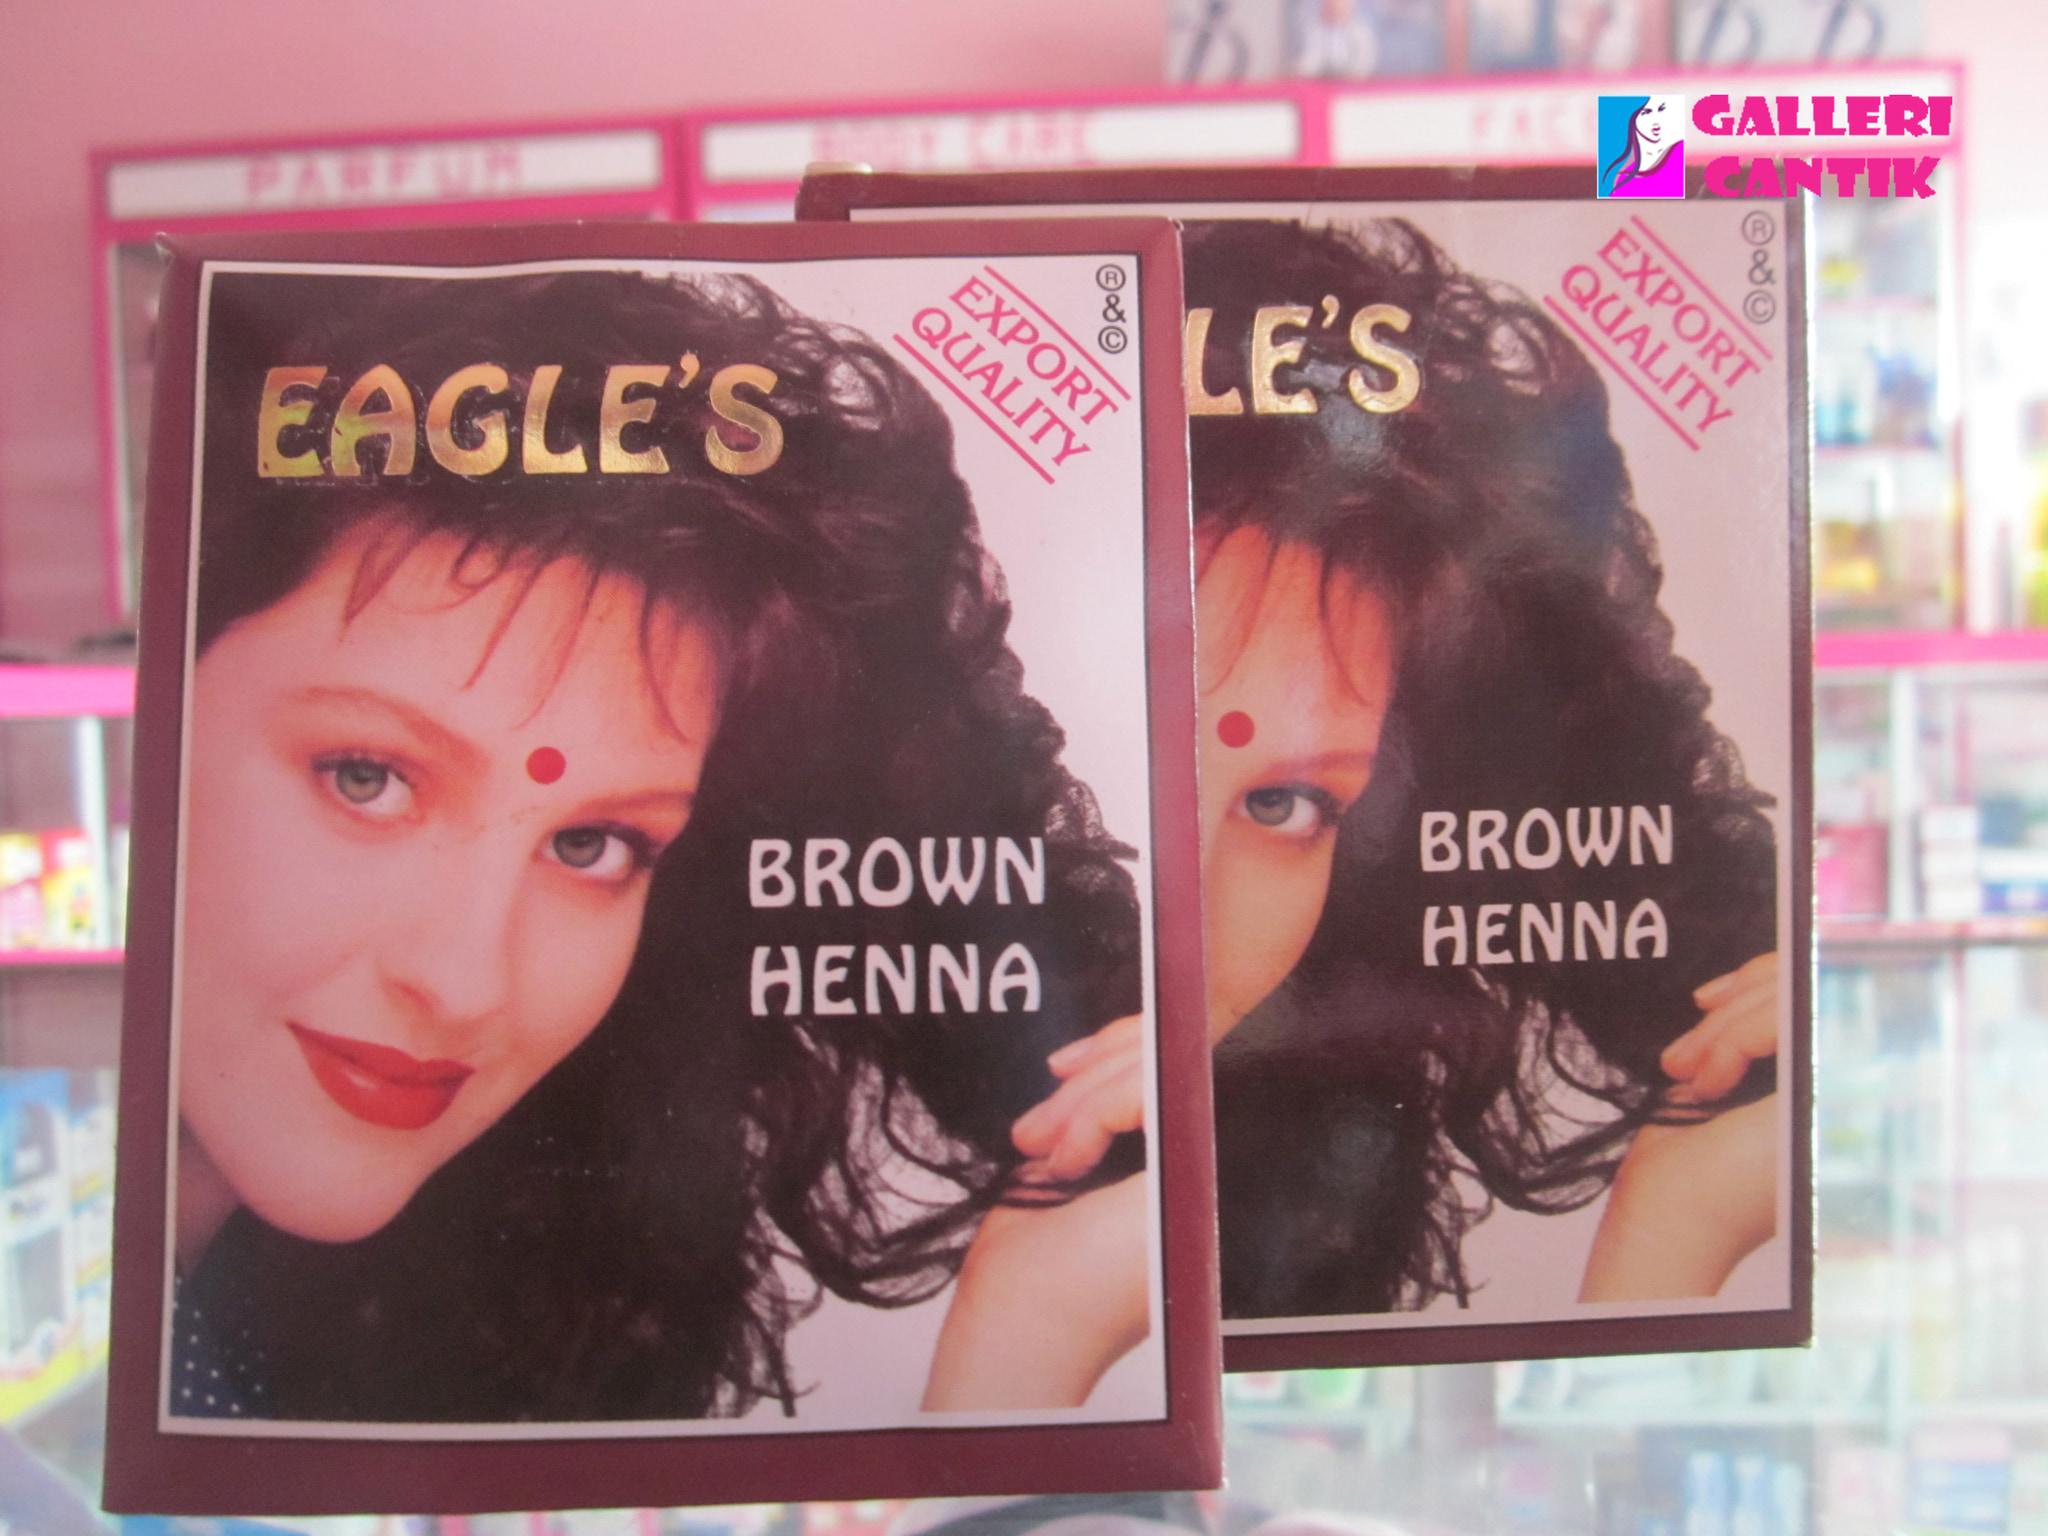 Jual Henna Cat Rambut Coklat Eagles S Brown Hena 10gr Galleri